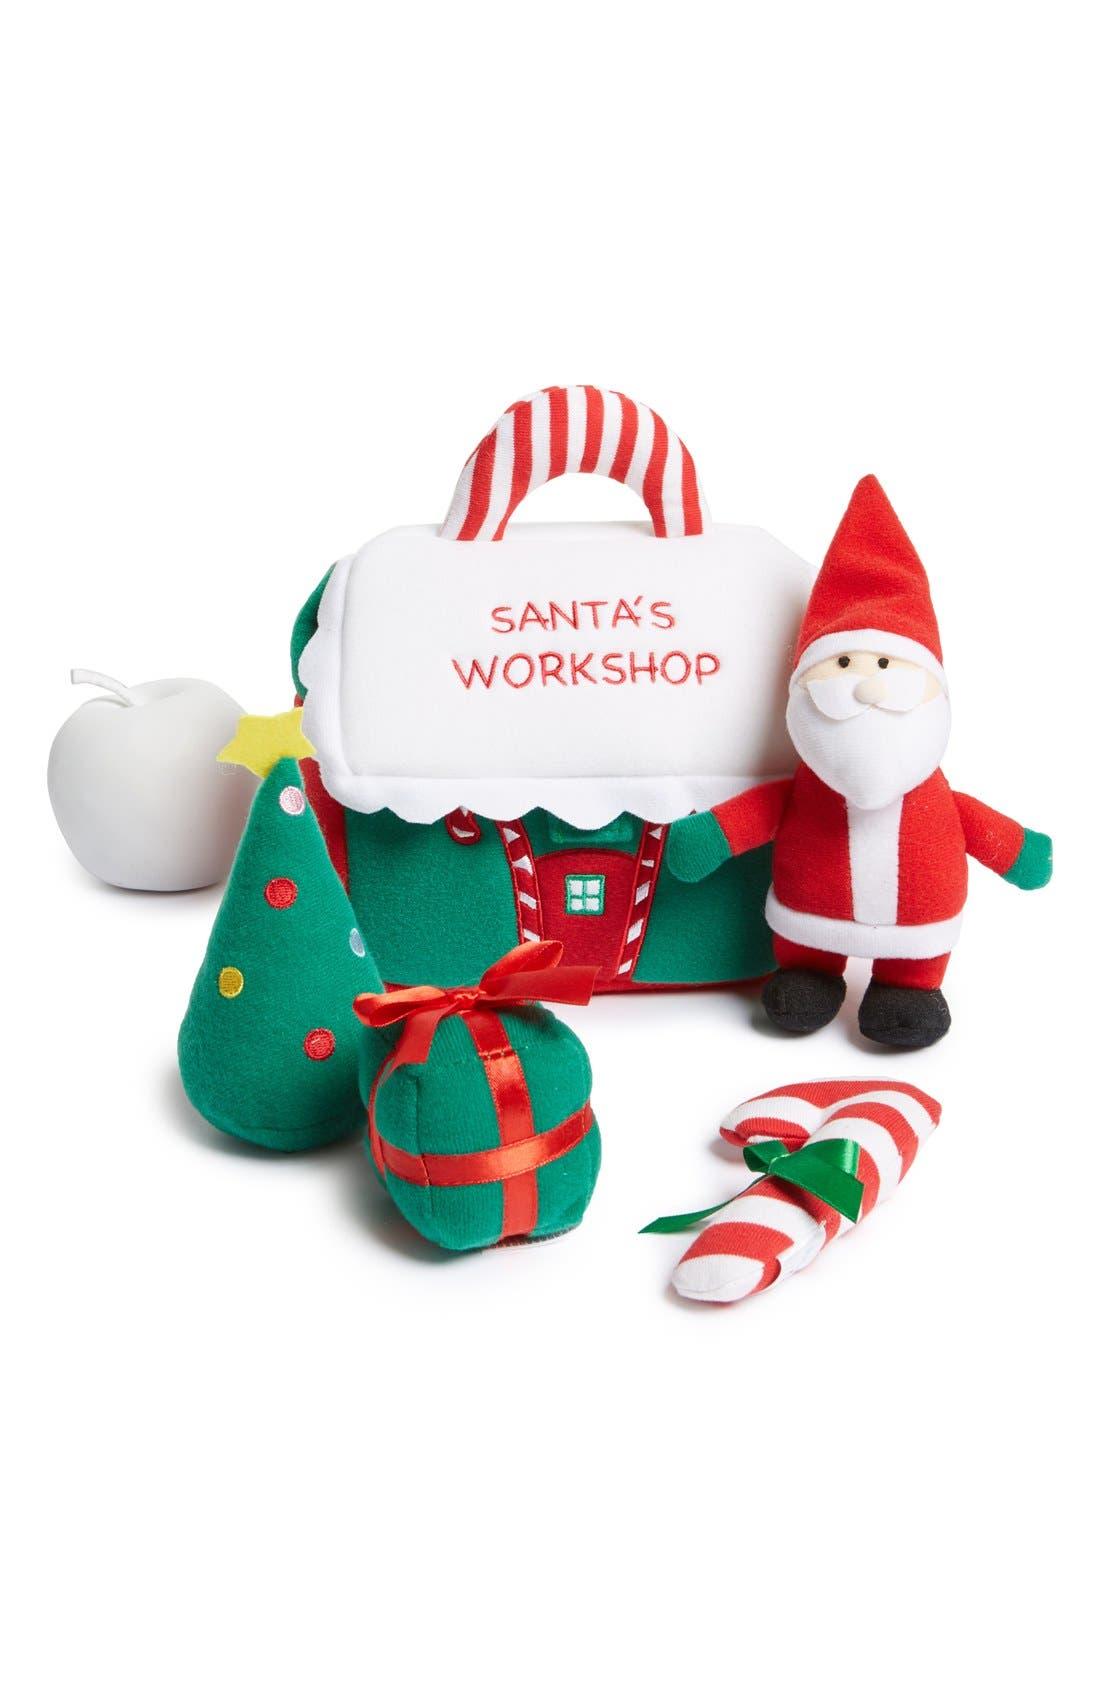 Gund 'Santa's Workshop' Plush Play Set (5-Piece)